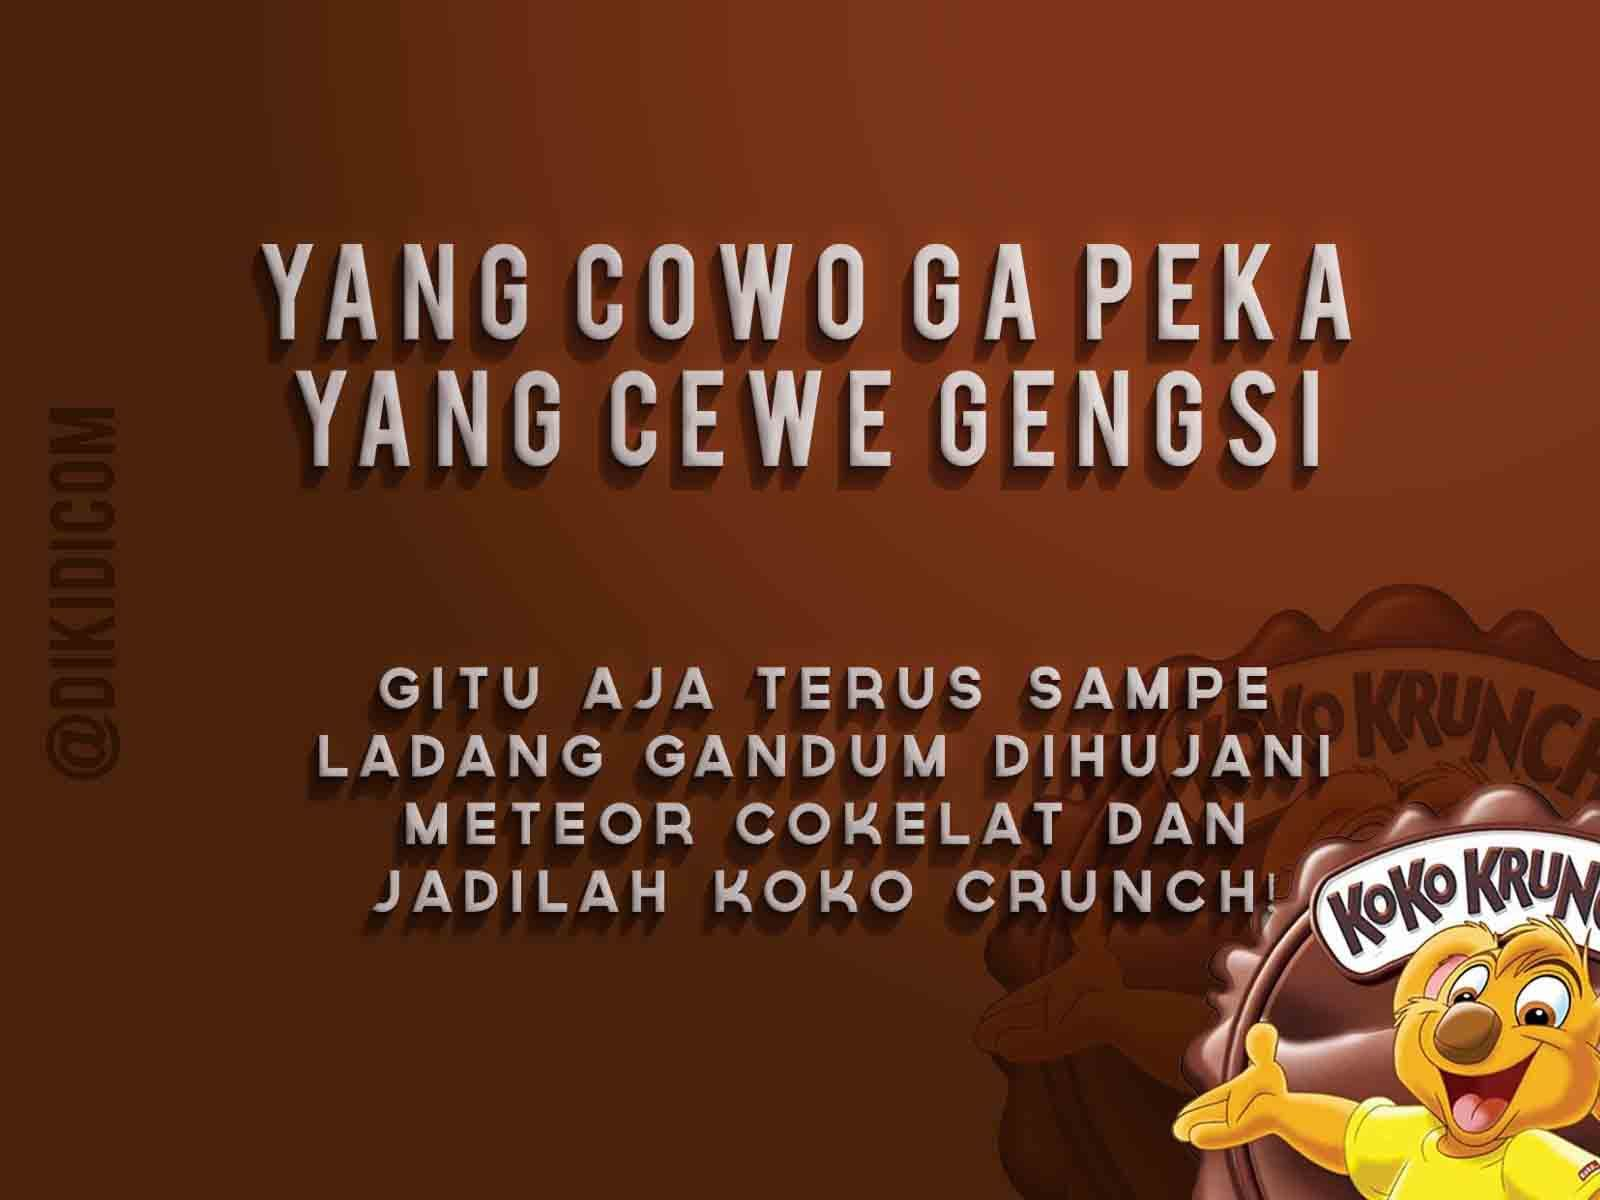 Lama Lama Direbut Orang Meme Indonesia Pinterest